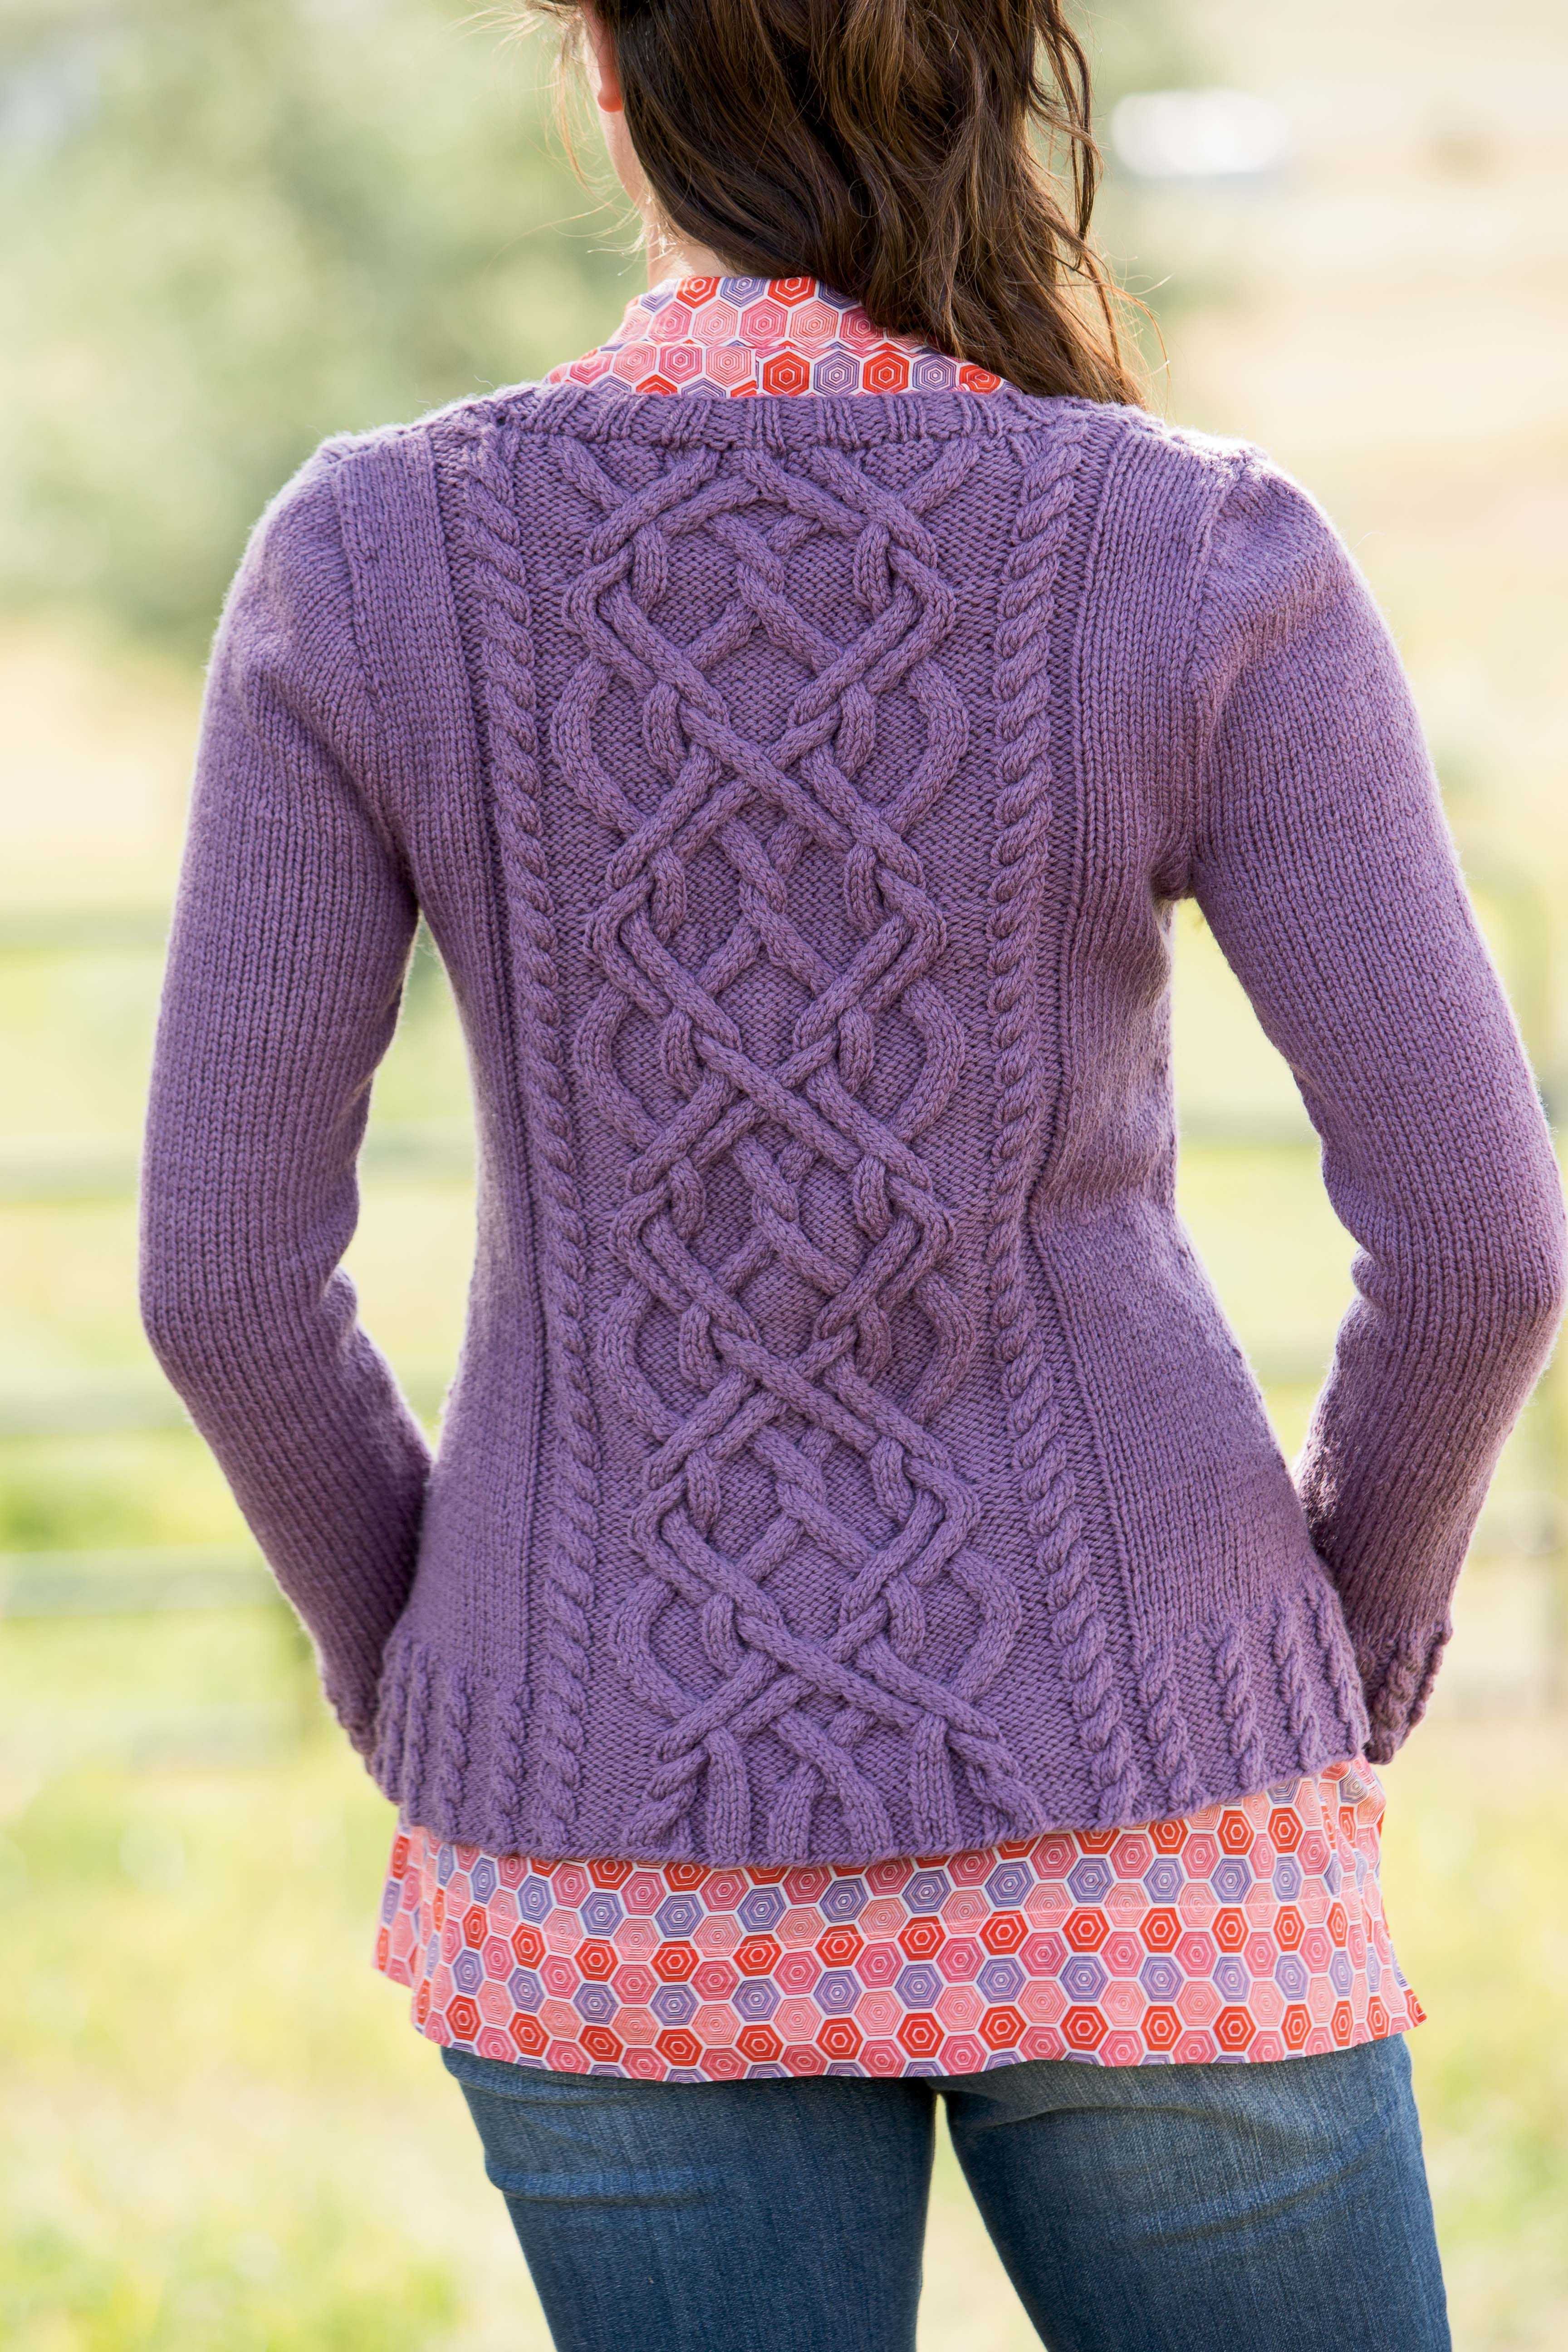 Knitted Yarn Patterns and Knitting Tutorials | Mantel ...